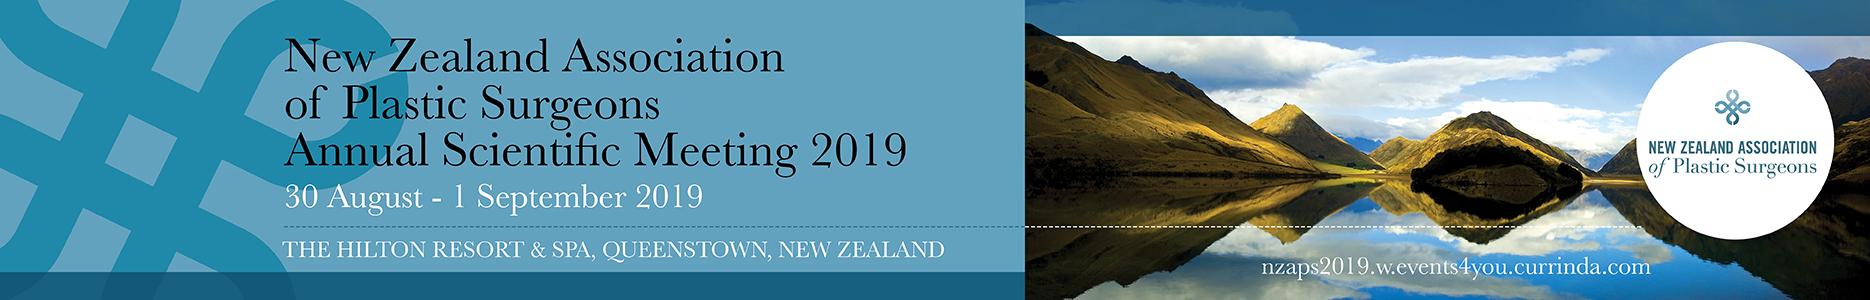 New Zealand Association of Plastic Surgeons Annual